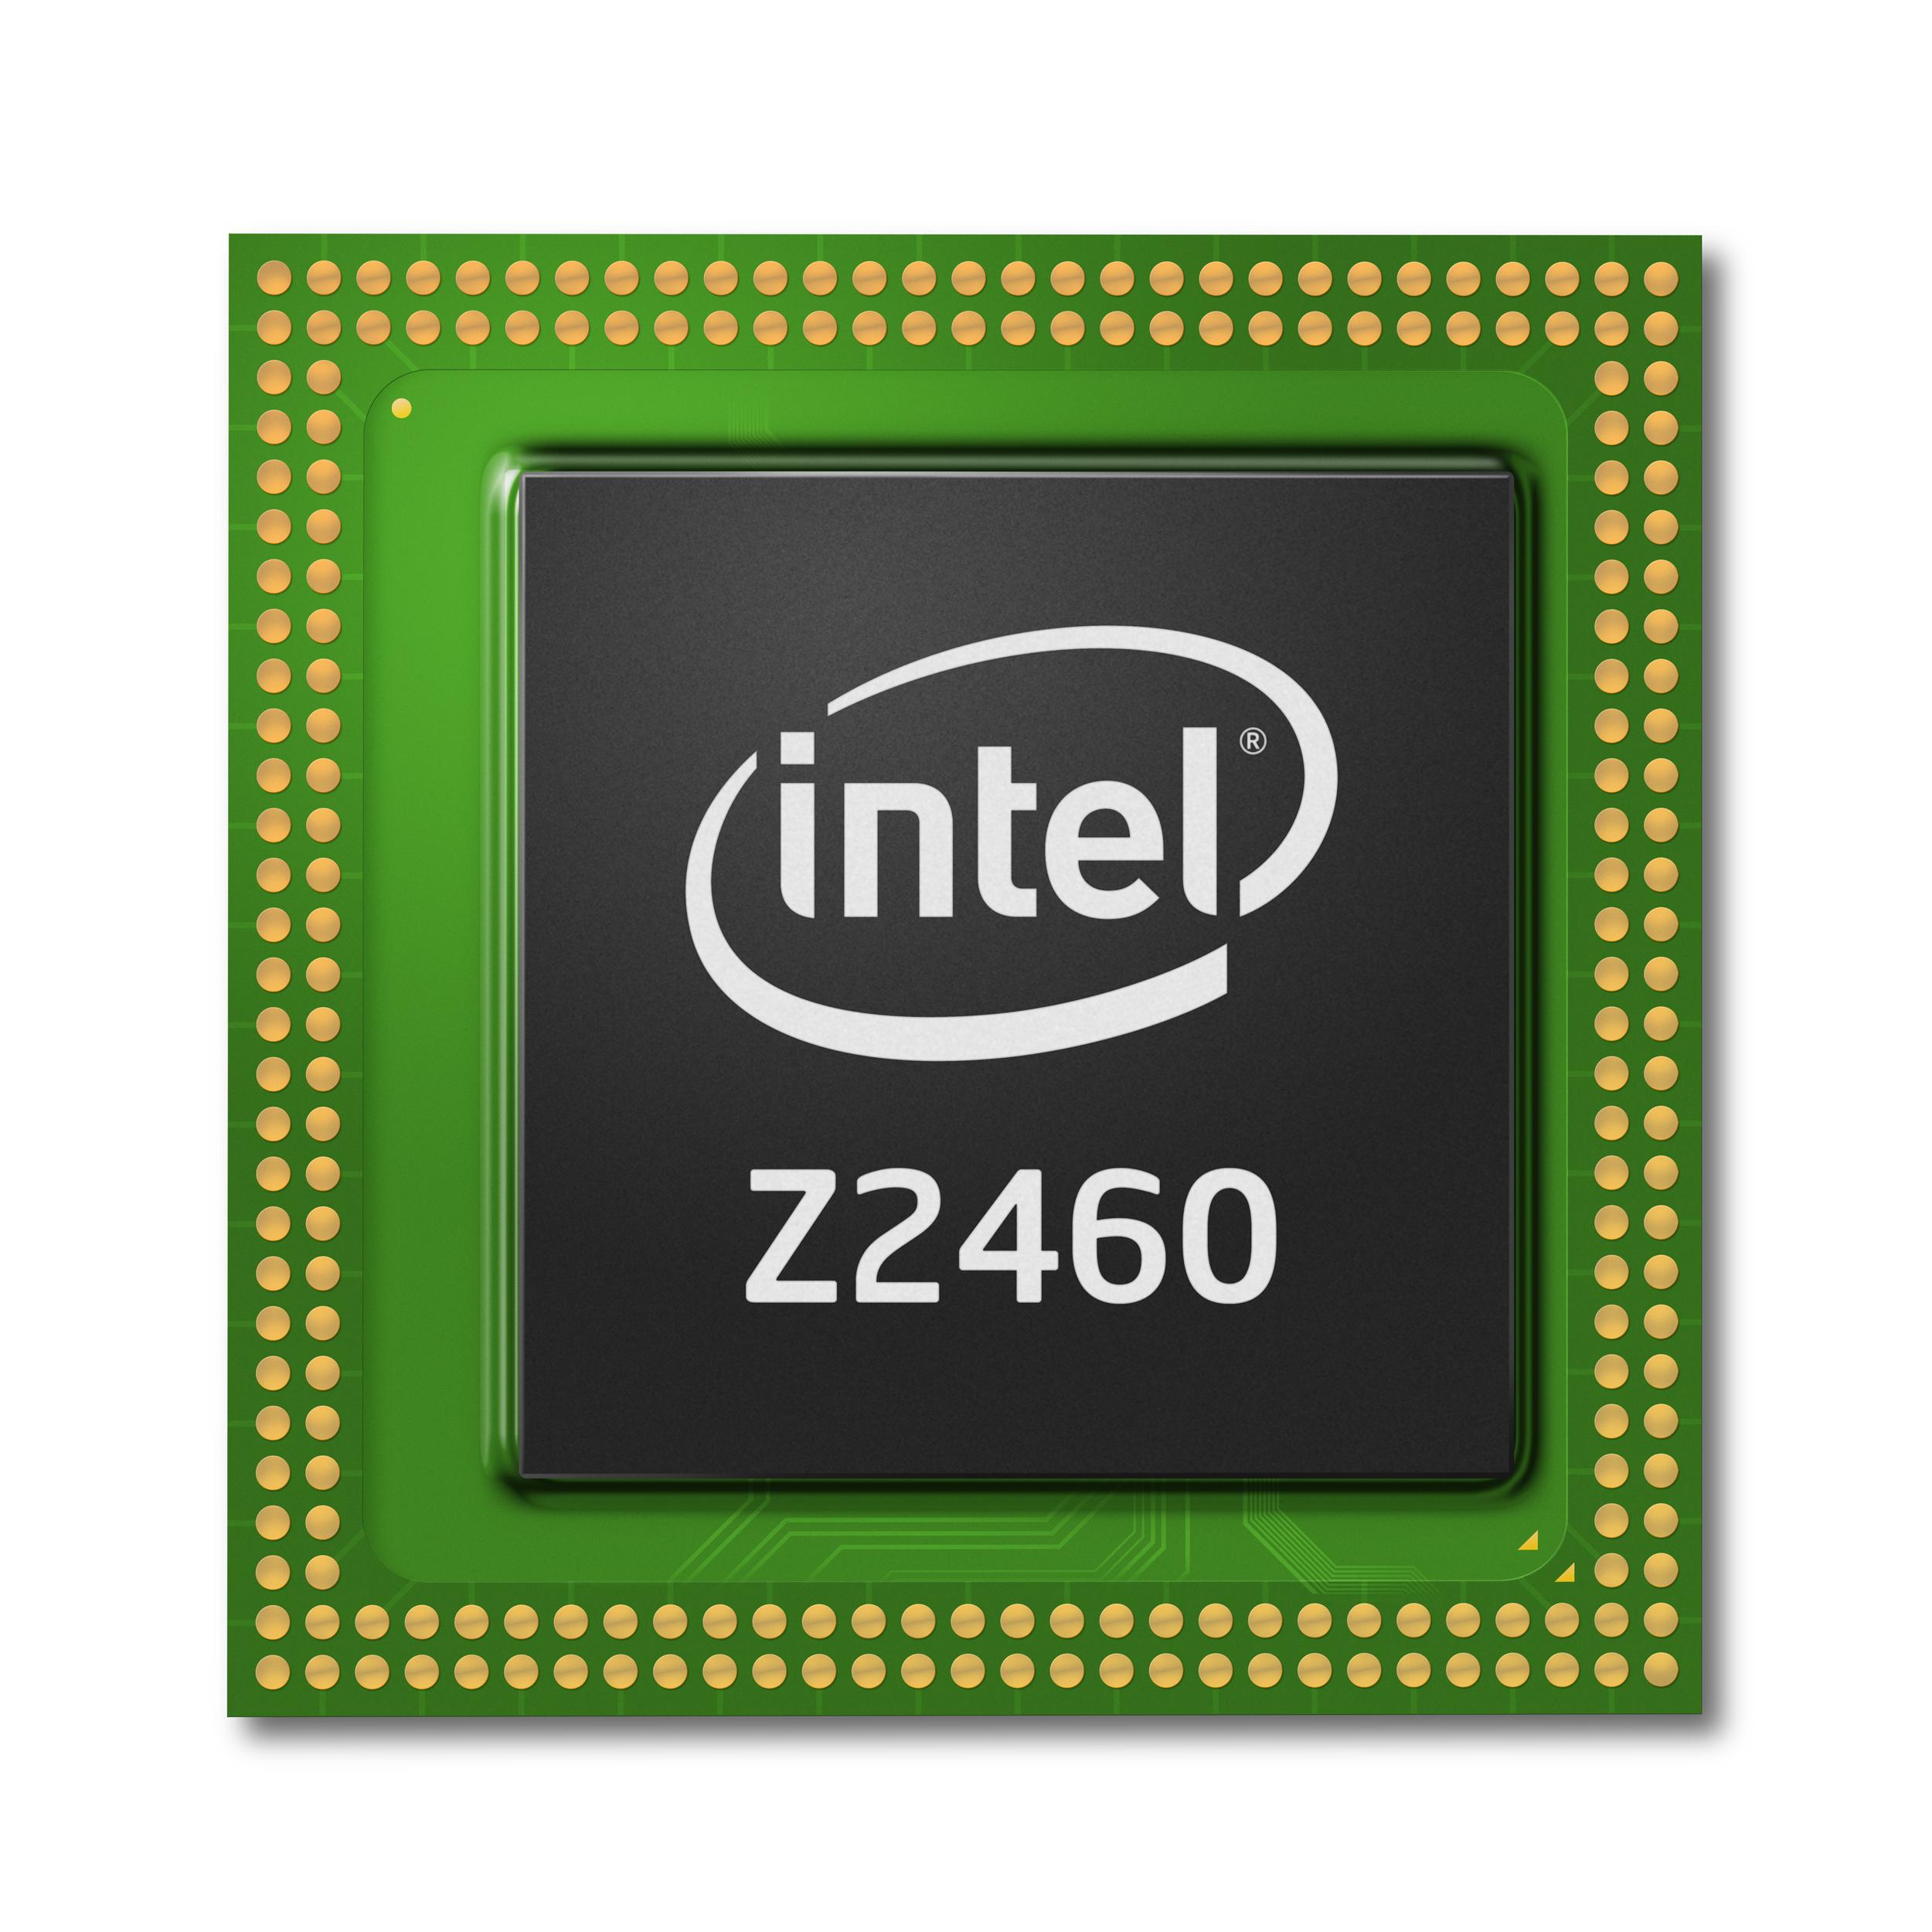 Intel_Atom_Processor_Z2460_FrontZ.jpg